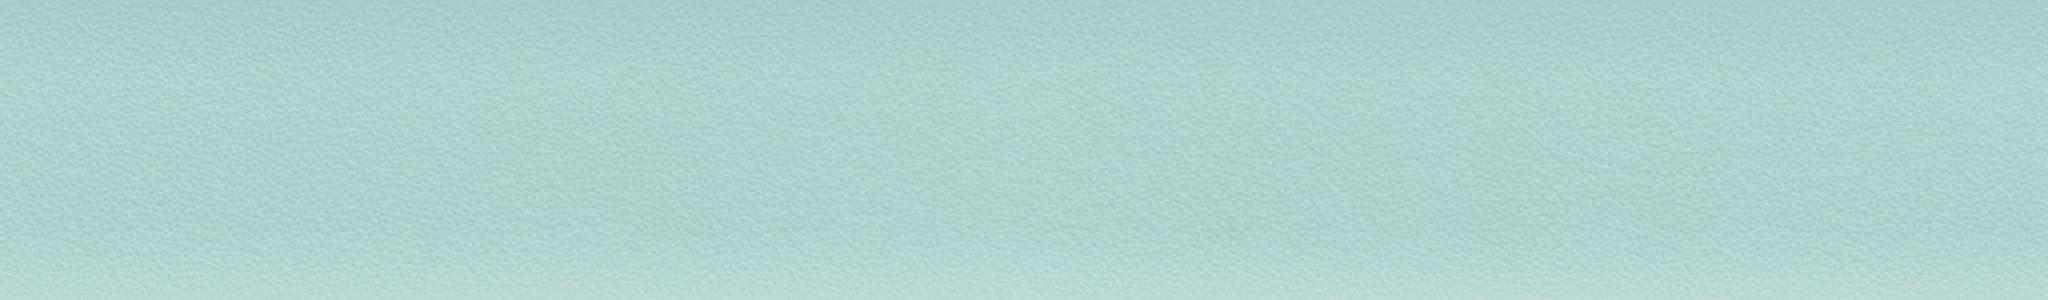 HU 16647 ABS hrana zelená perla 101